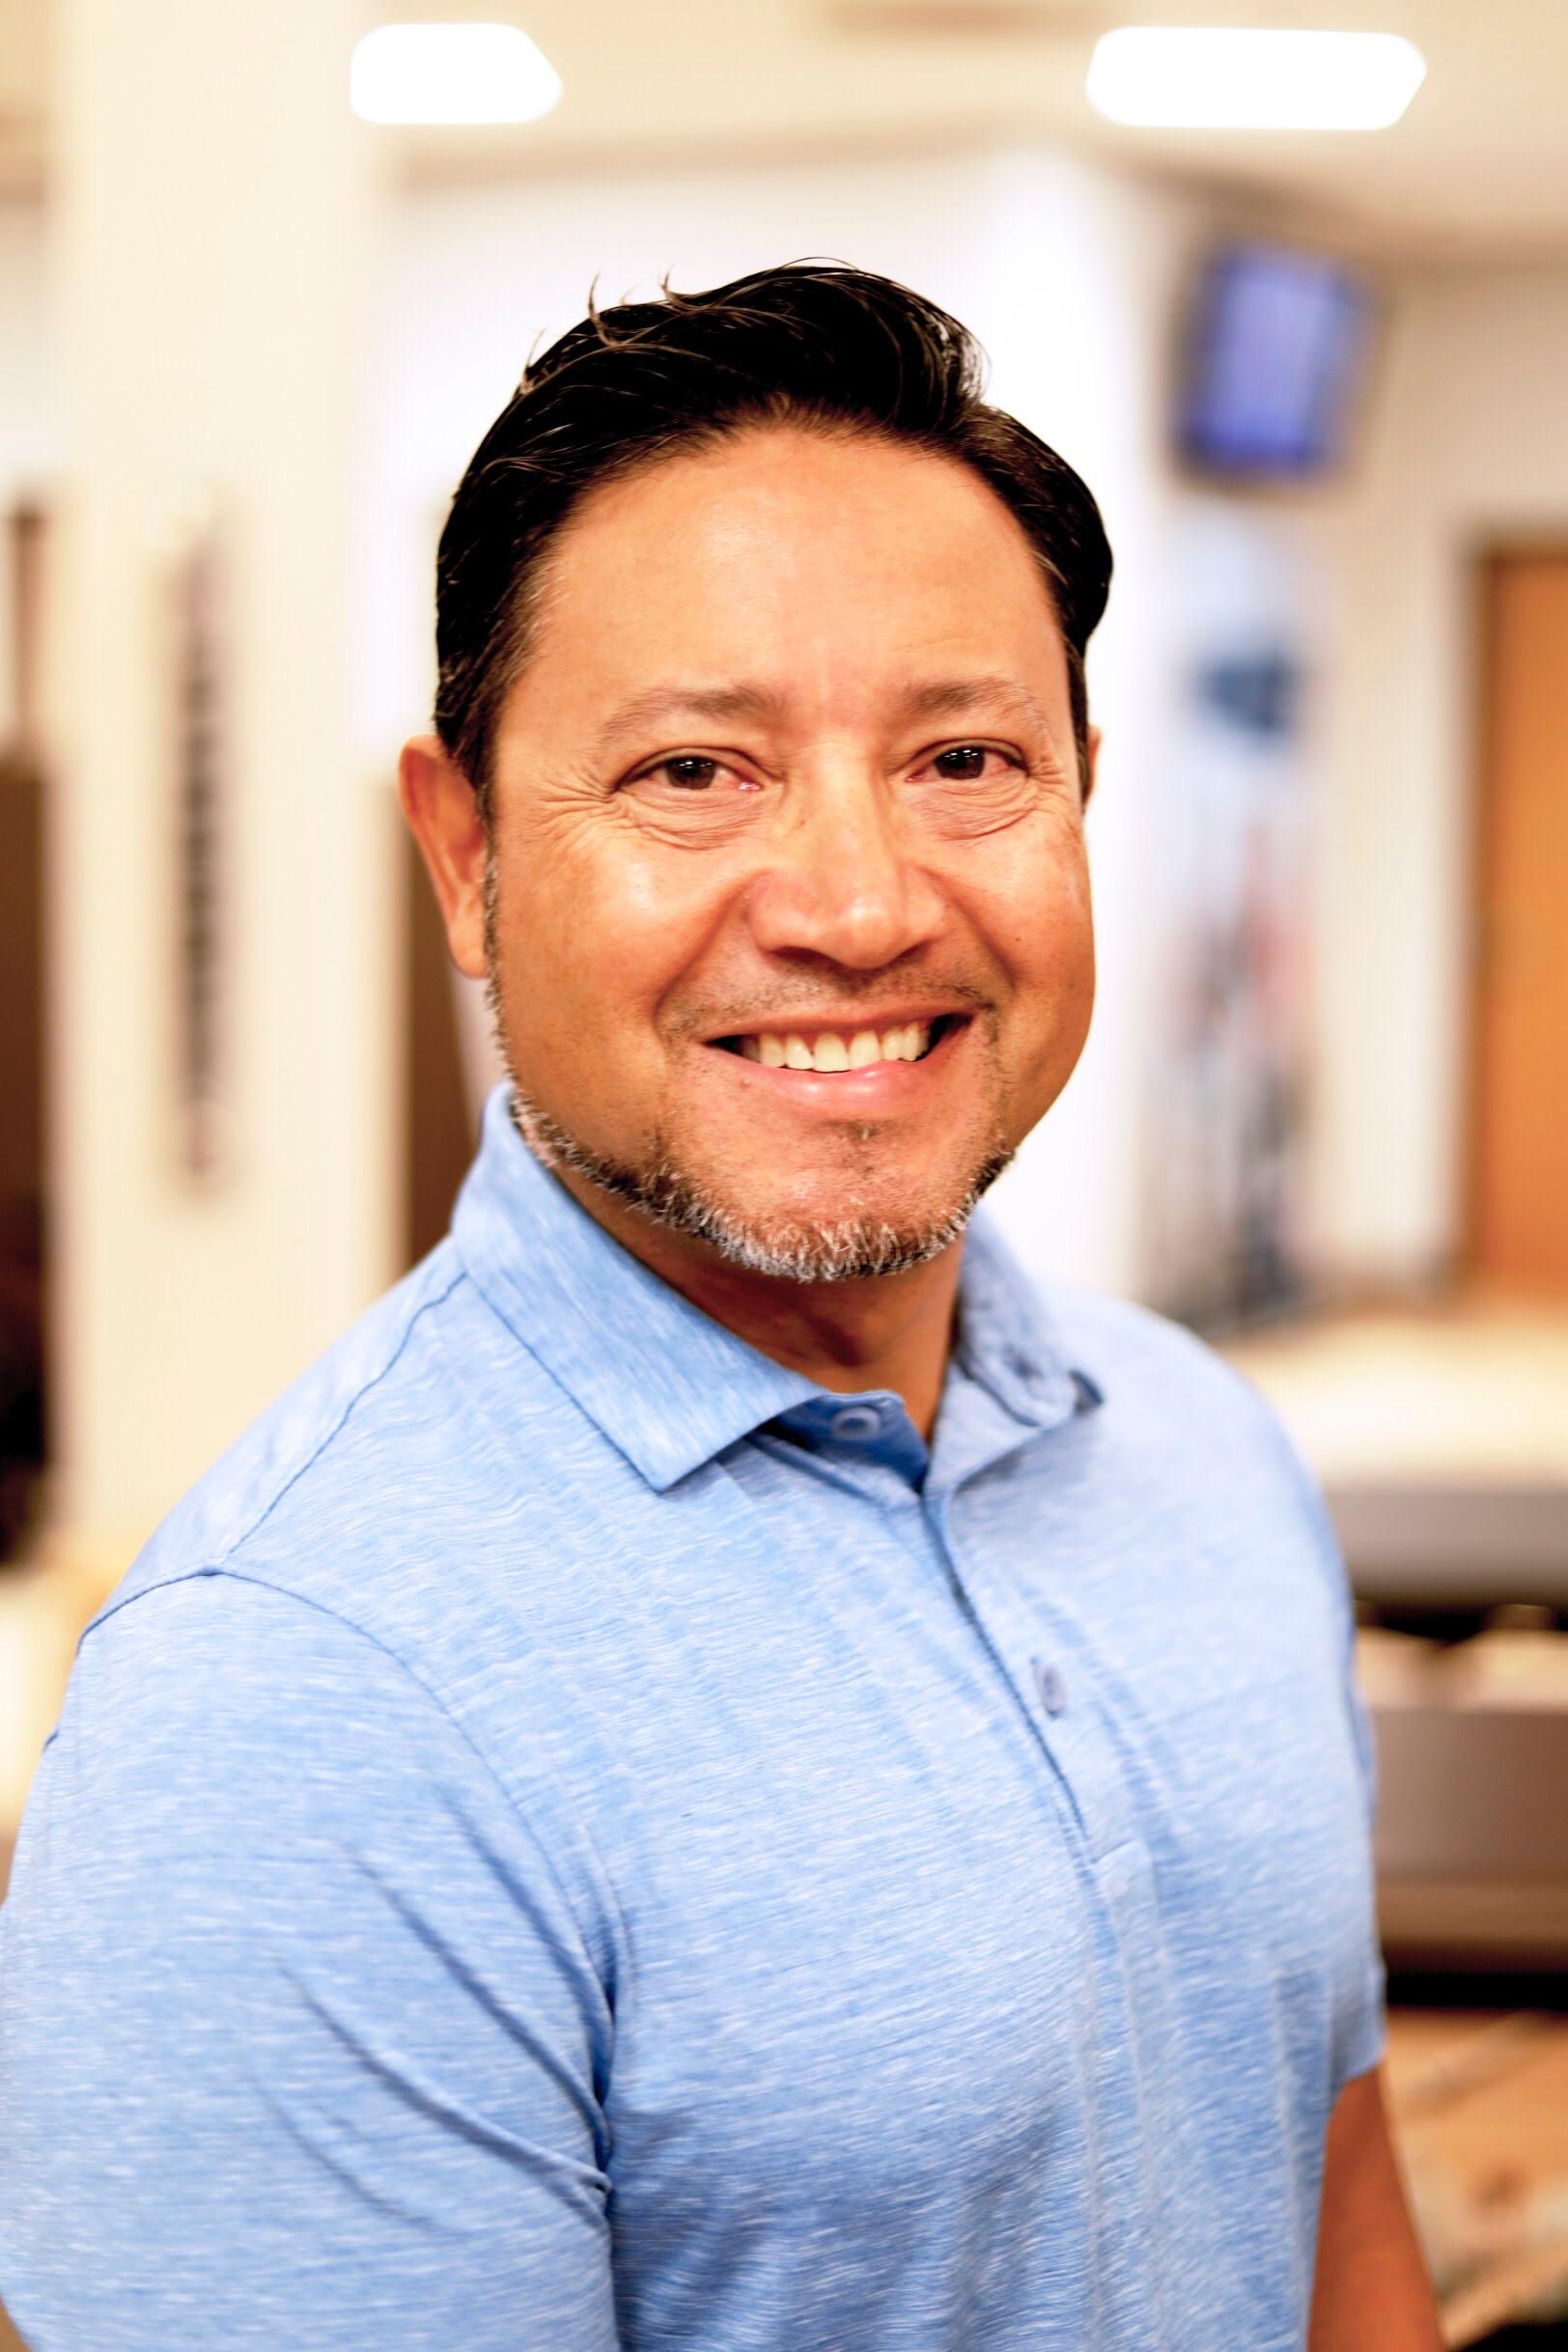 Dr Jose Lara Dc Phoenix Chiropractor Gonstead Physical Medicine